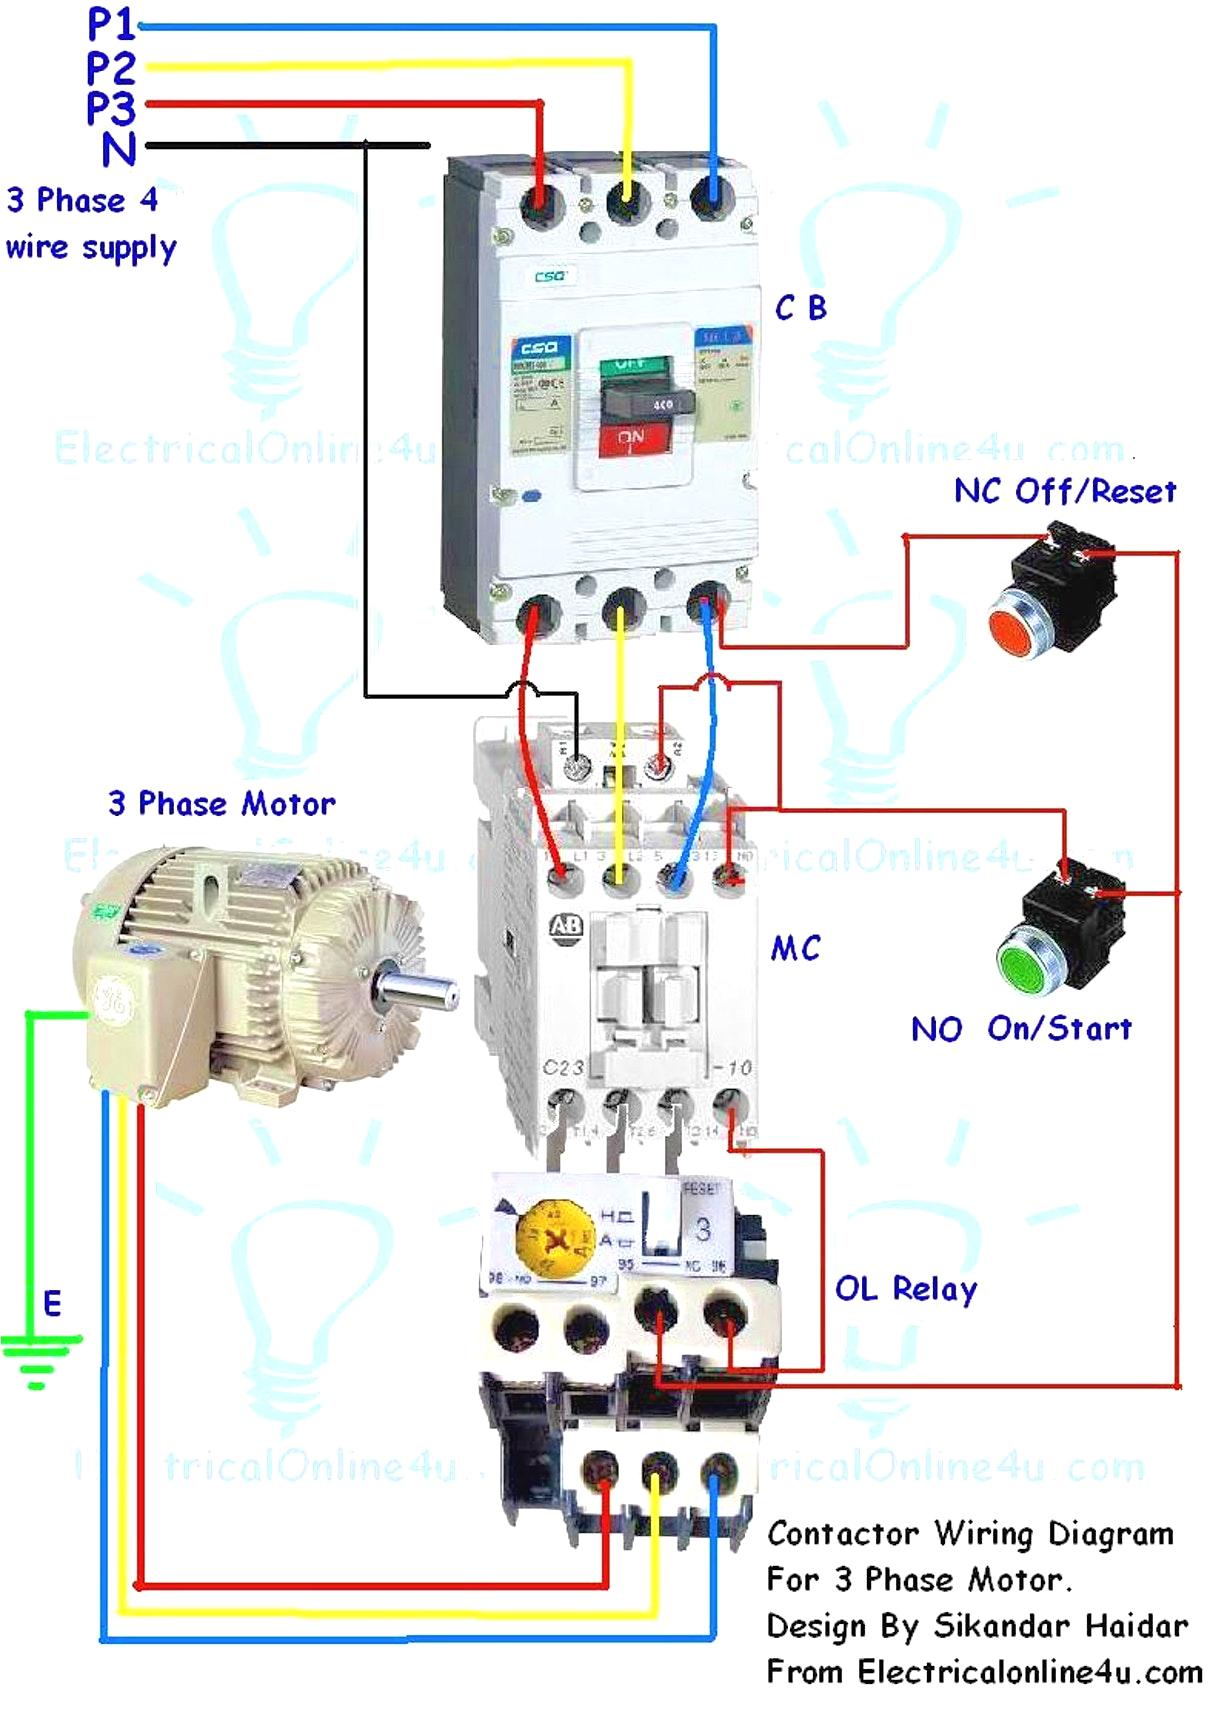 wiring diagram nc24 blog wiring diagram ie contactor wiring diagram